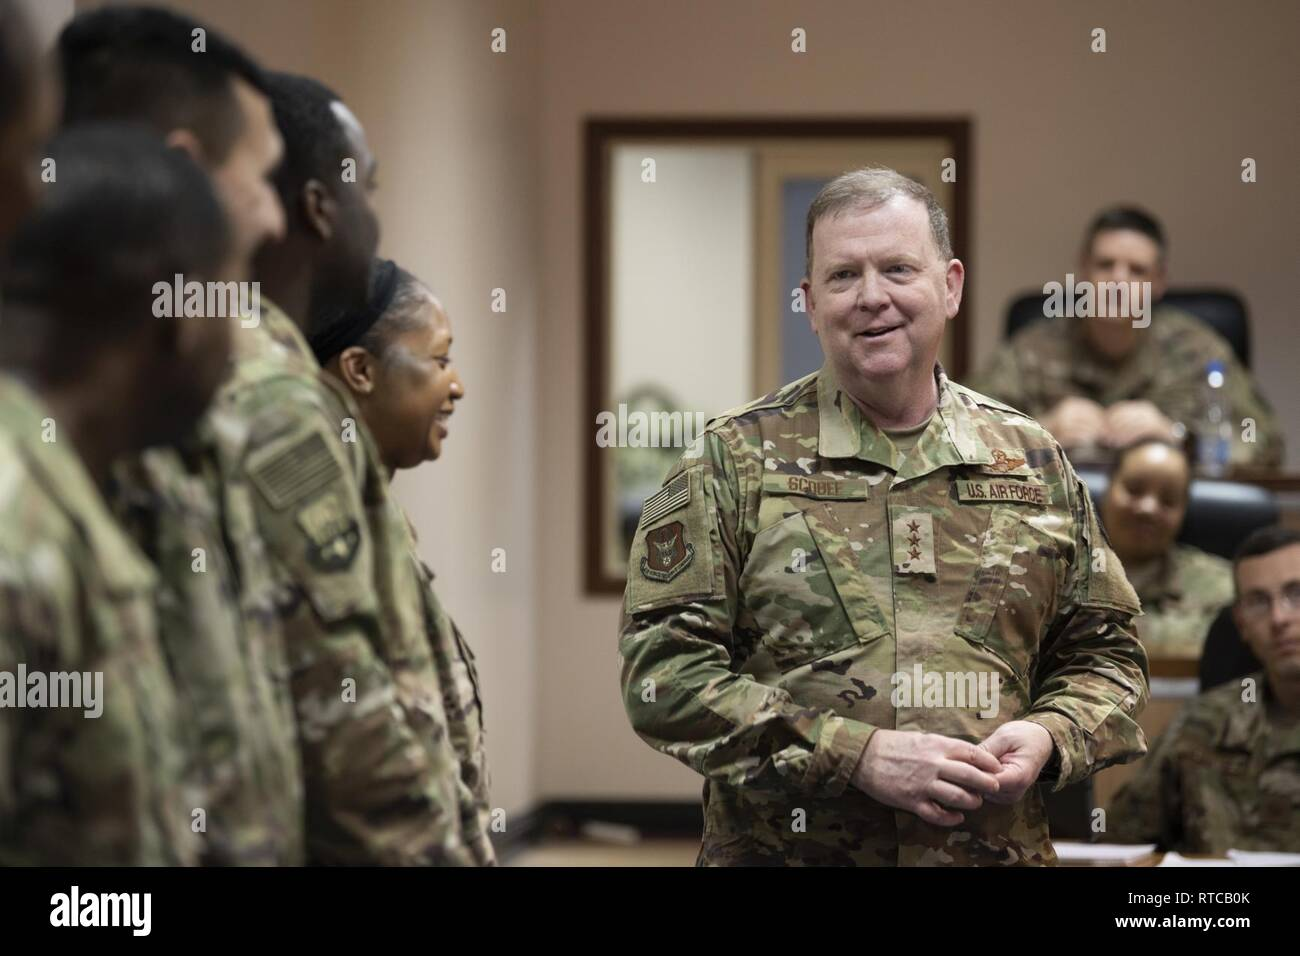 Lt  Gen  Richard Scobee, Air Force Reserve commander, speaks